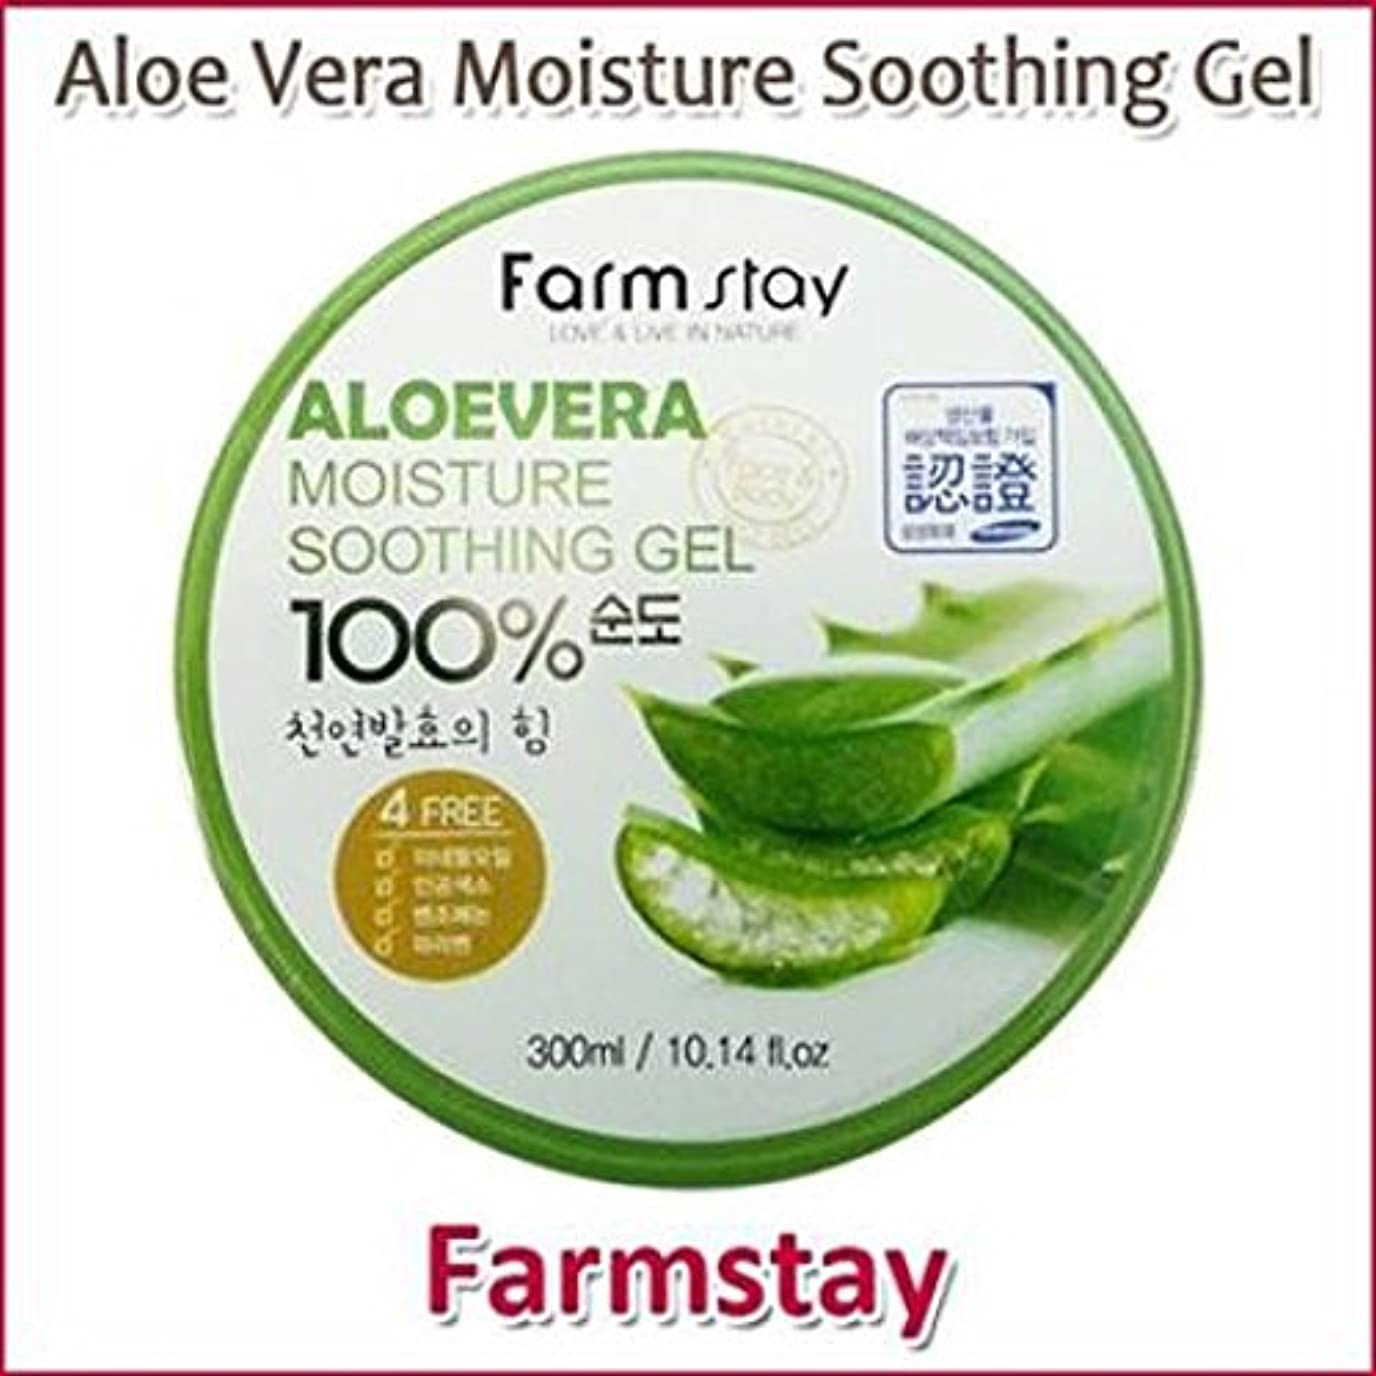 Farm Stay Aloe Vera Moisture Soothing Gel 300ml /オーガニック アロエベラゲル 100%/保湿ケア/韓国コスメ/Aloe Vera 100% /Moisturizing [...